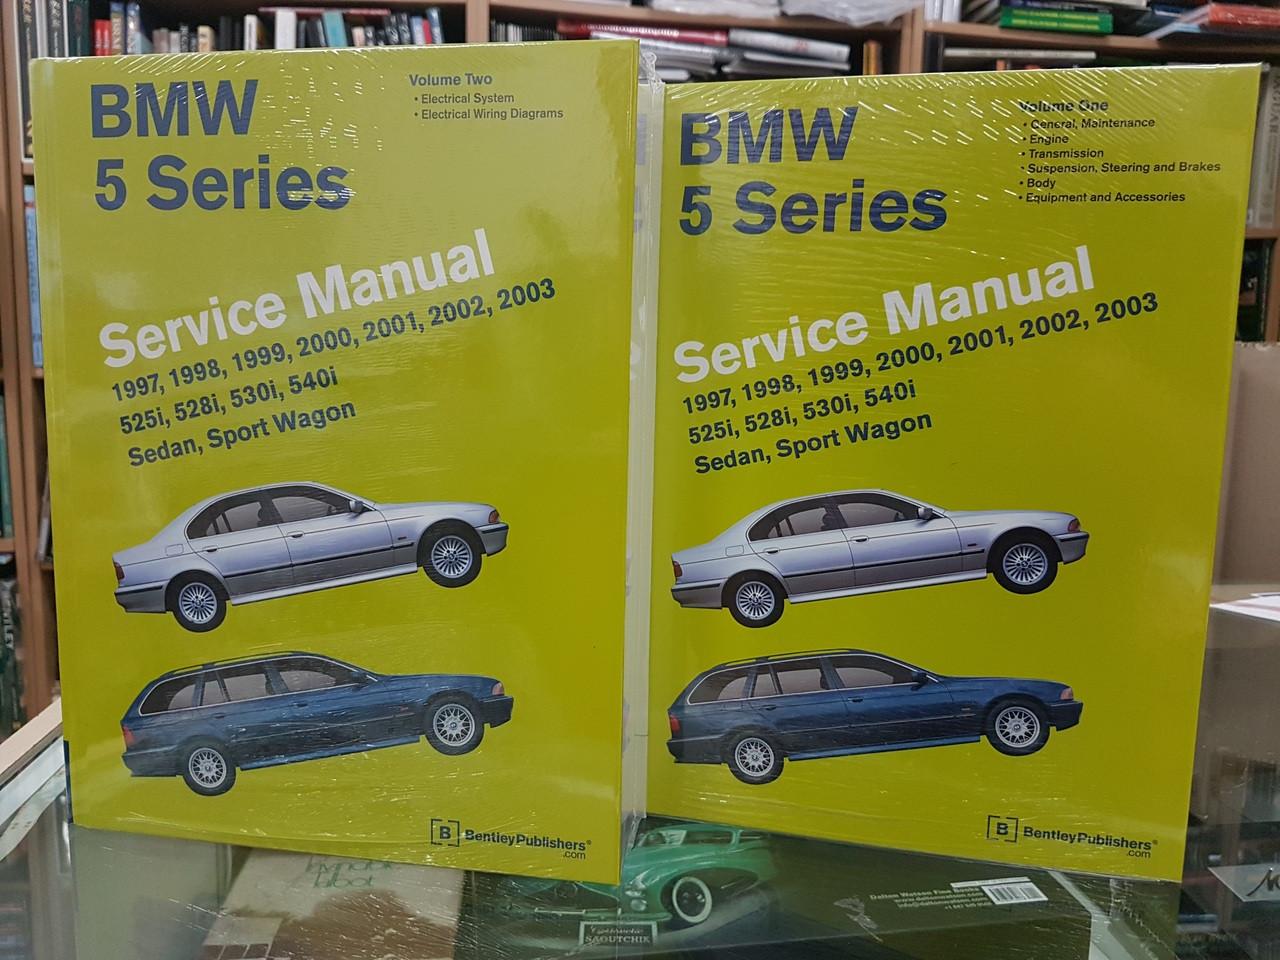 BMW 5 Series E39 525i, 528i, 530i, 540i 1997 - 2003 Workshop Manual